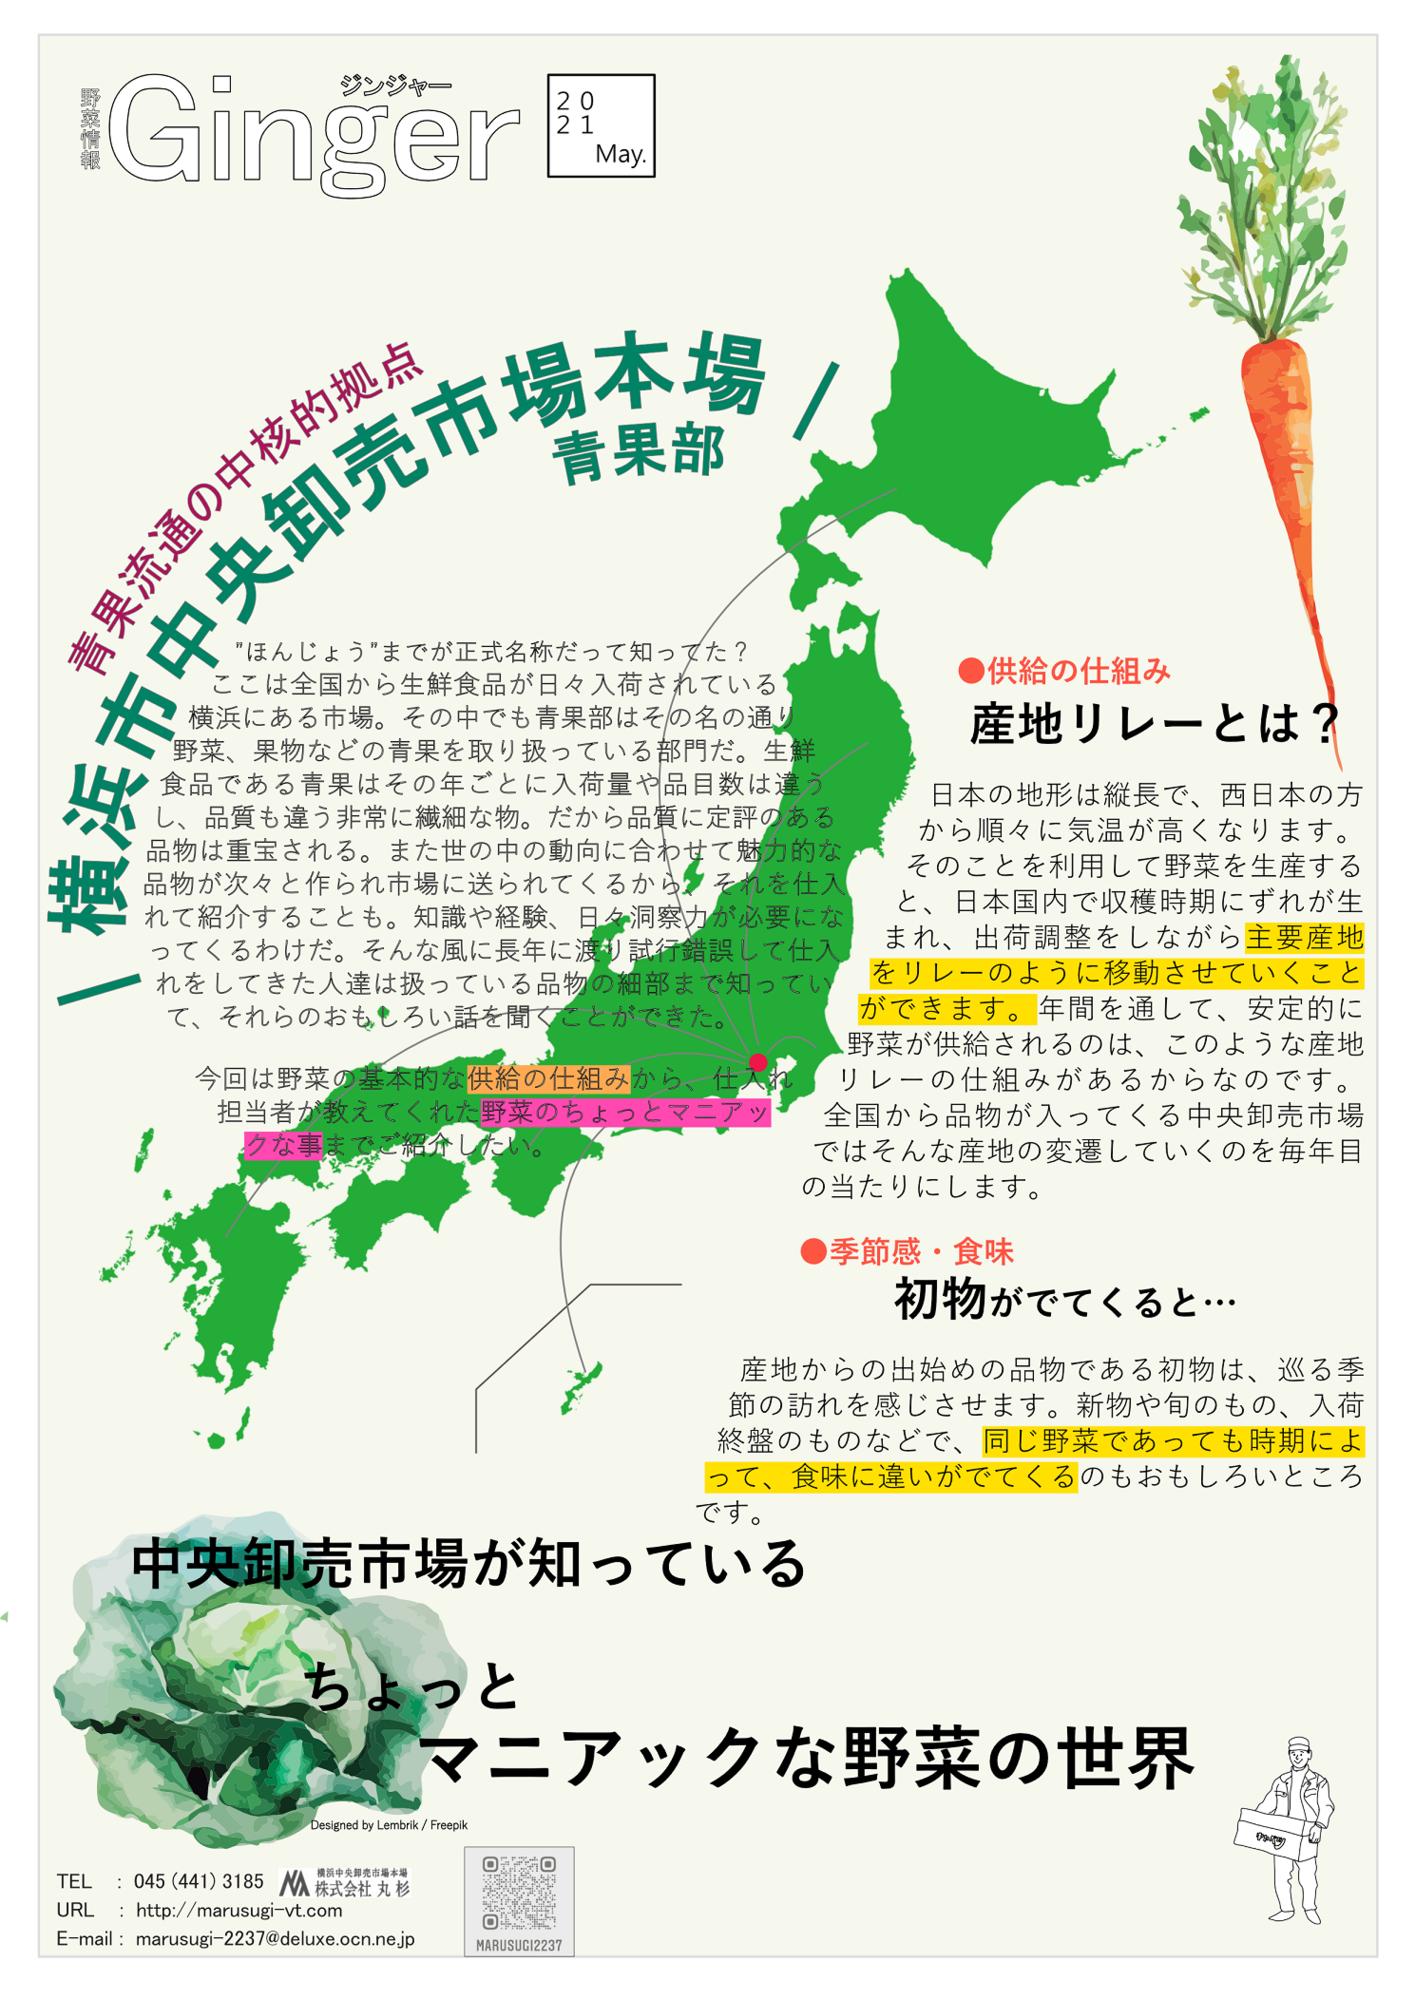 f:id:marusugi-2237:20210514112006p:plain